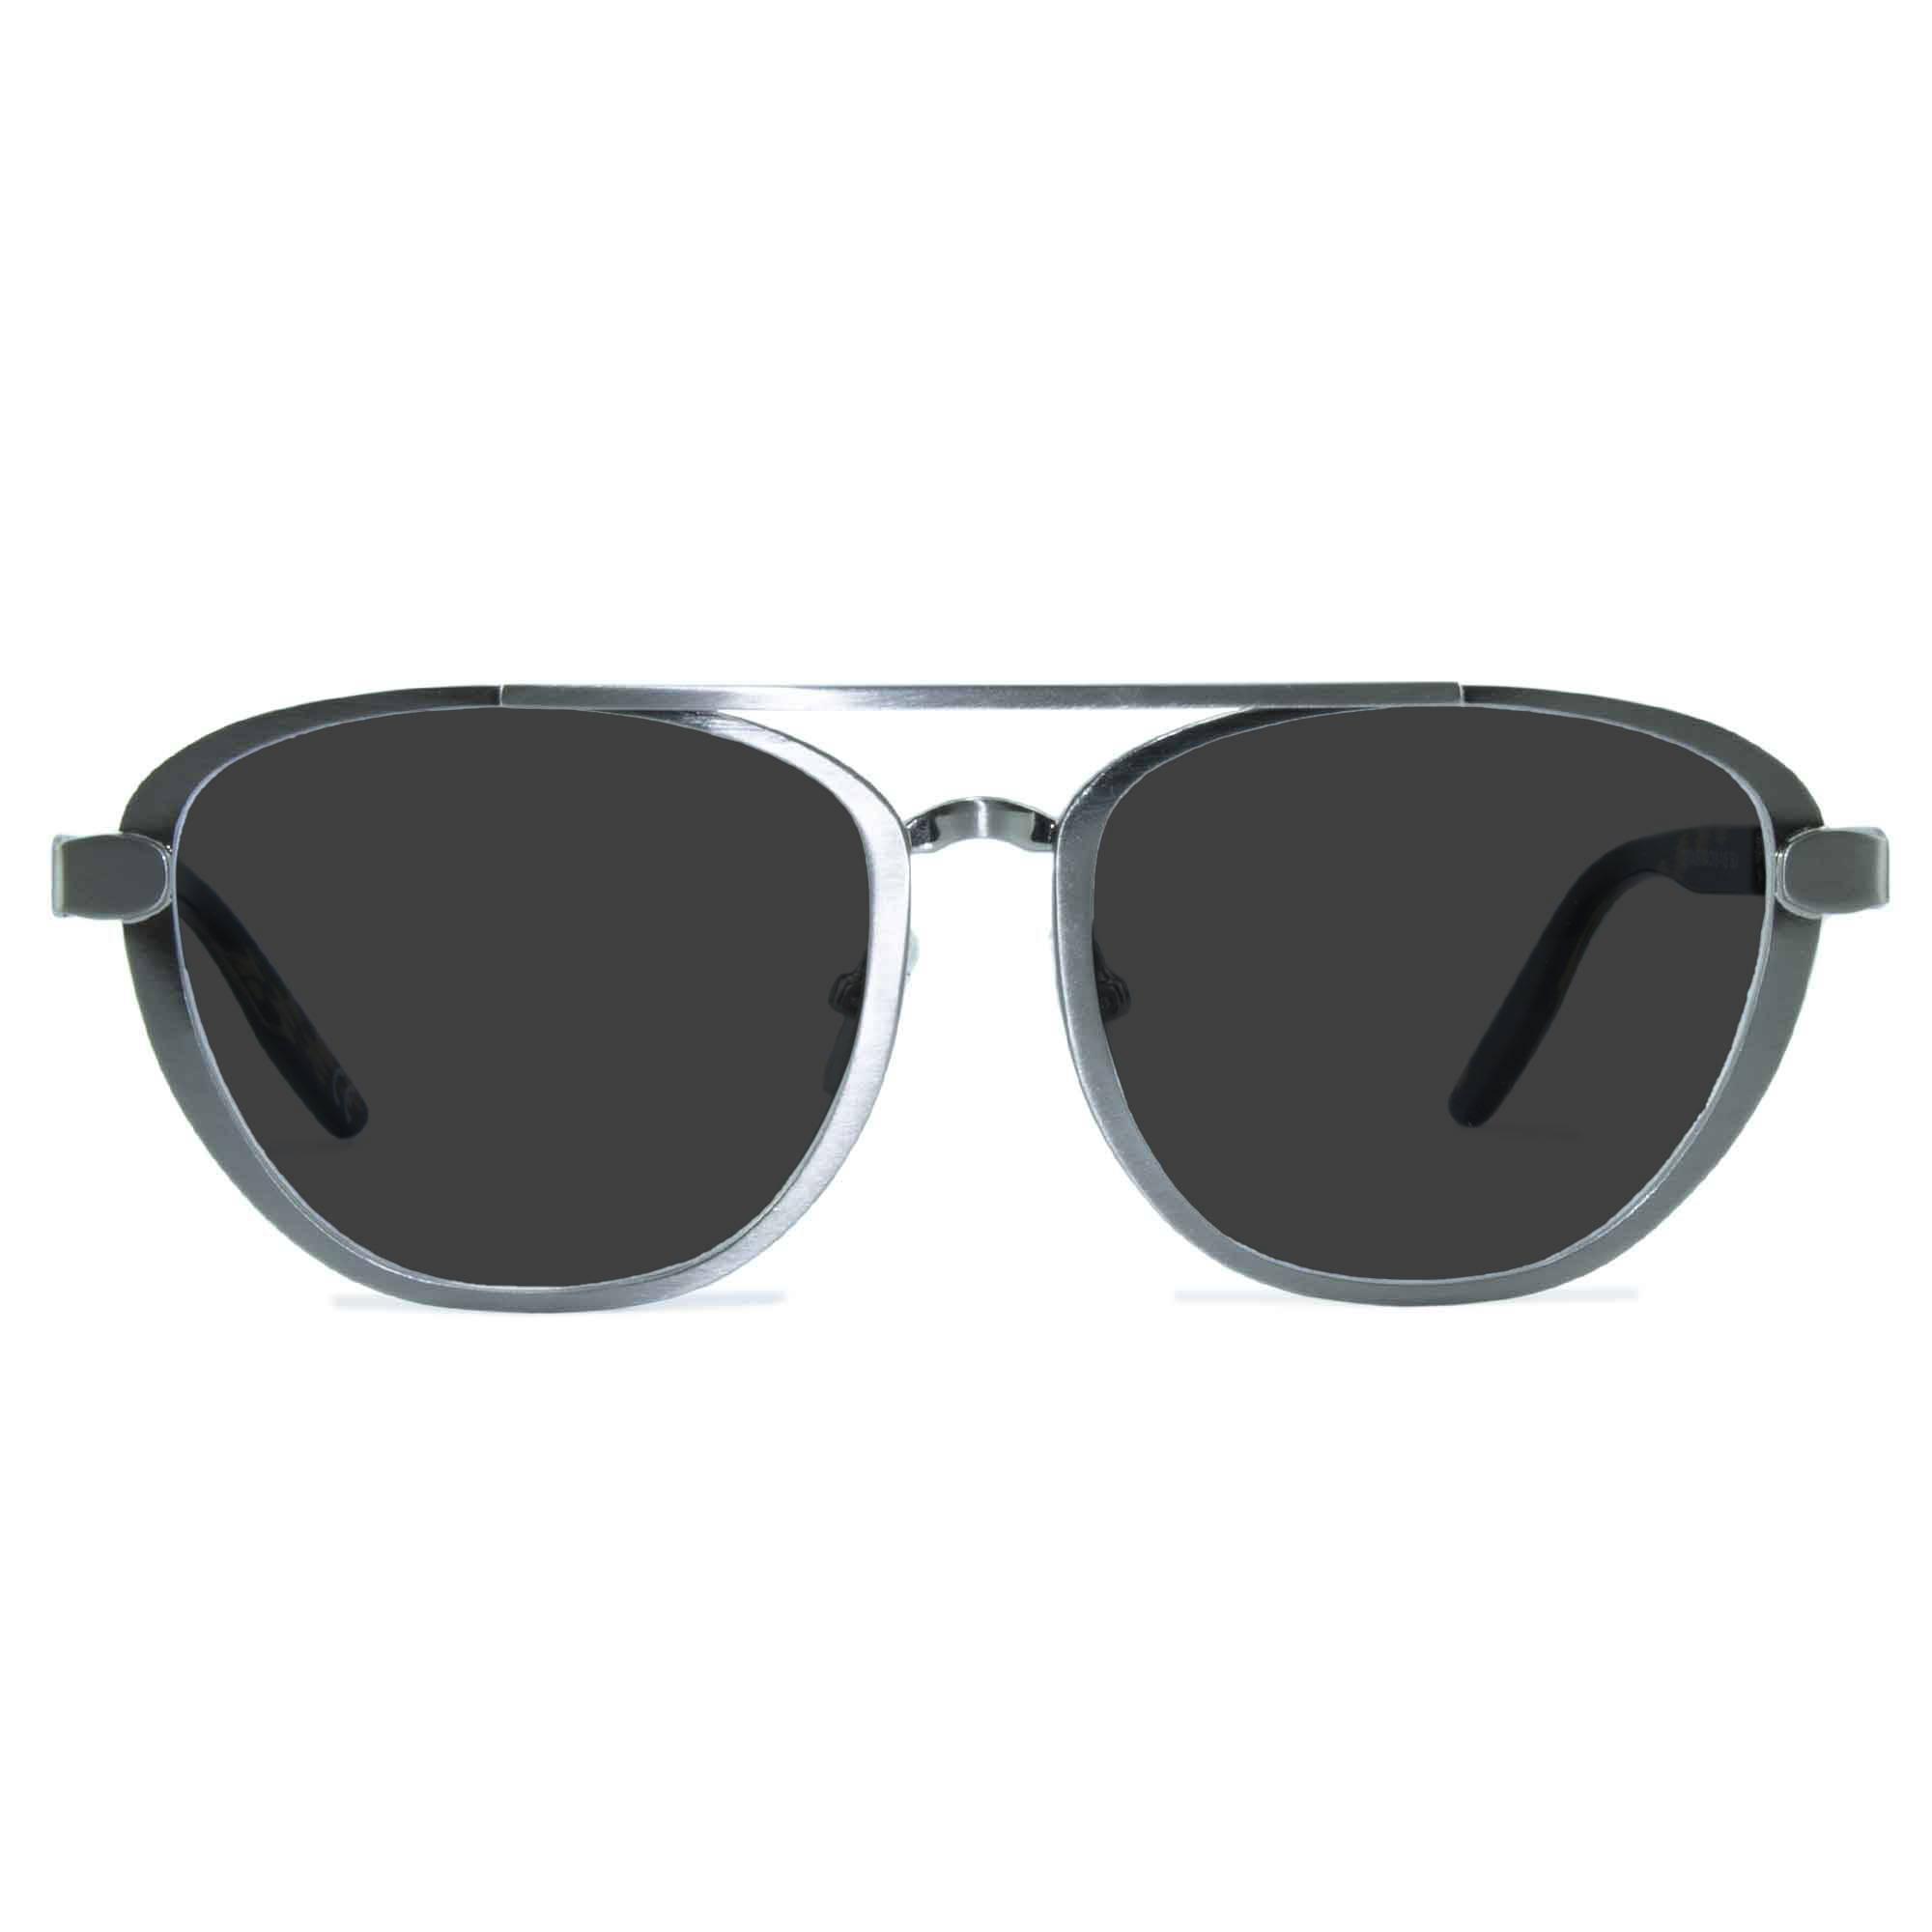 Joiuss dennis silver aviator sunglasses